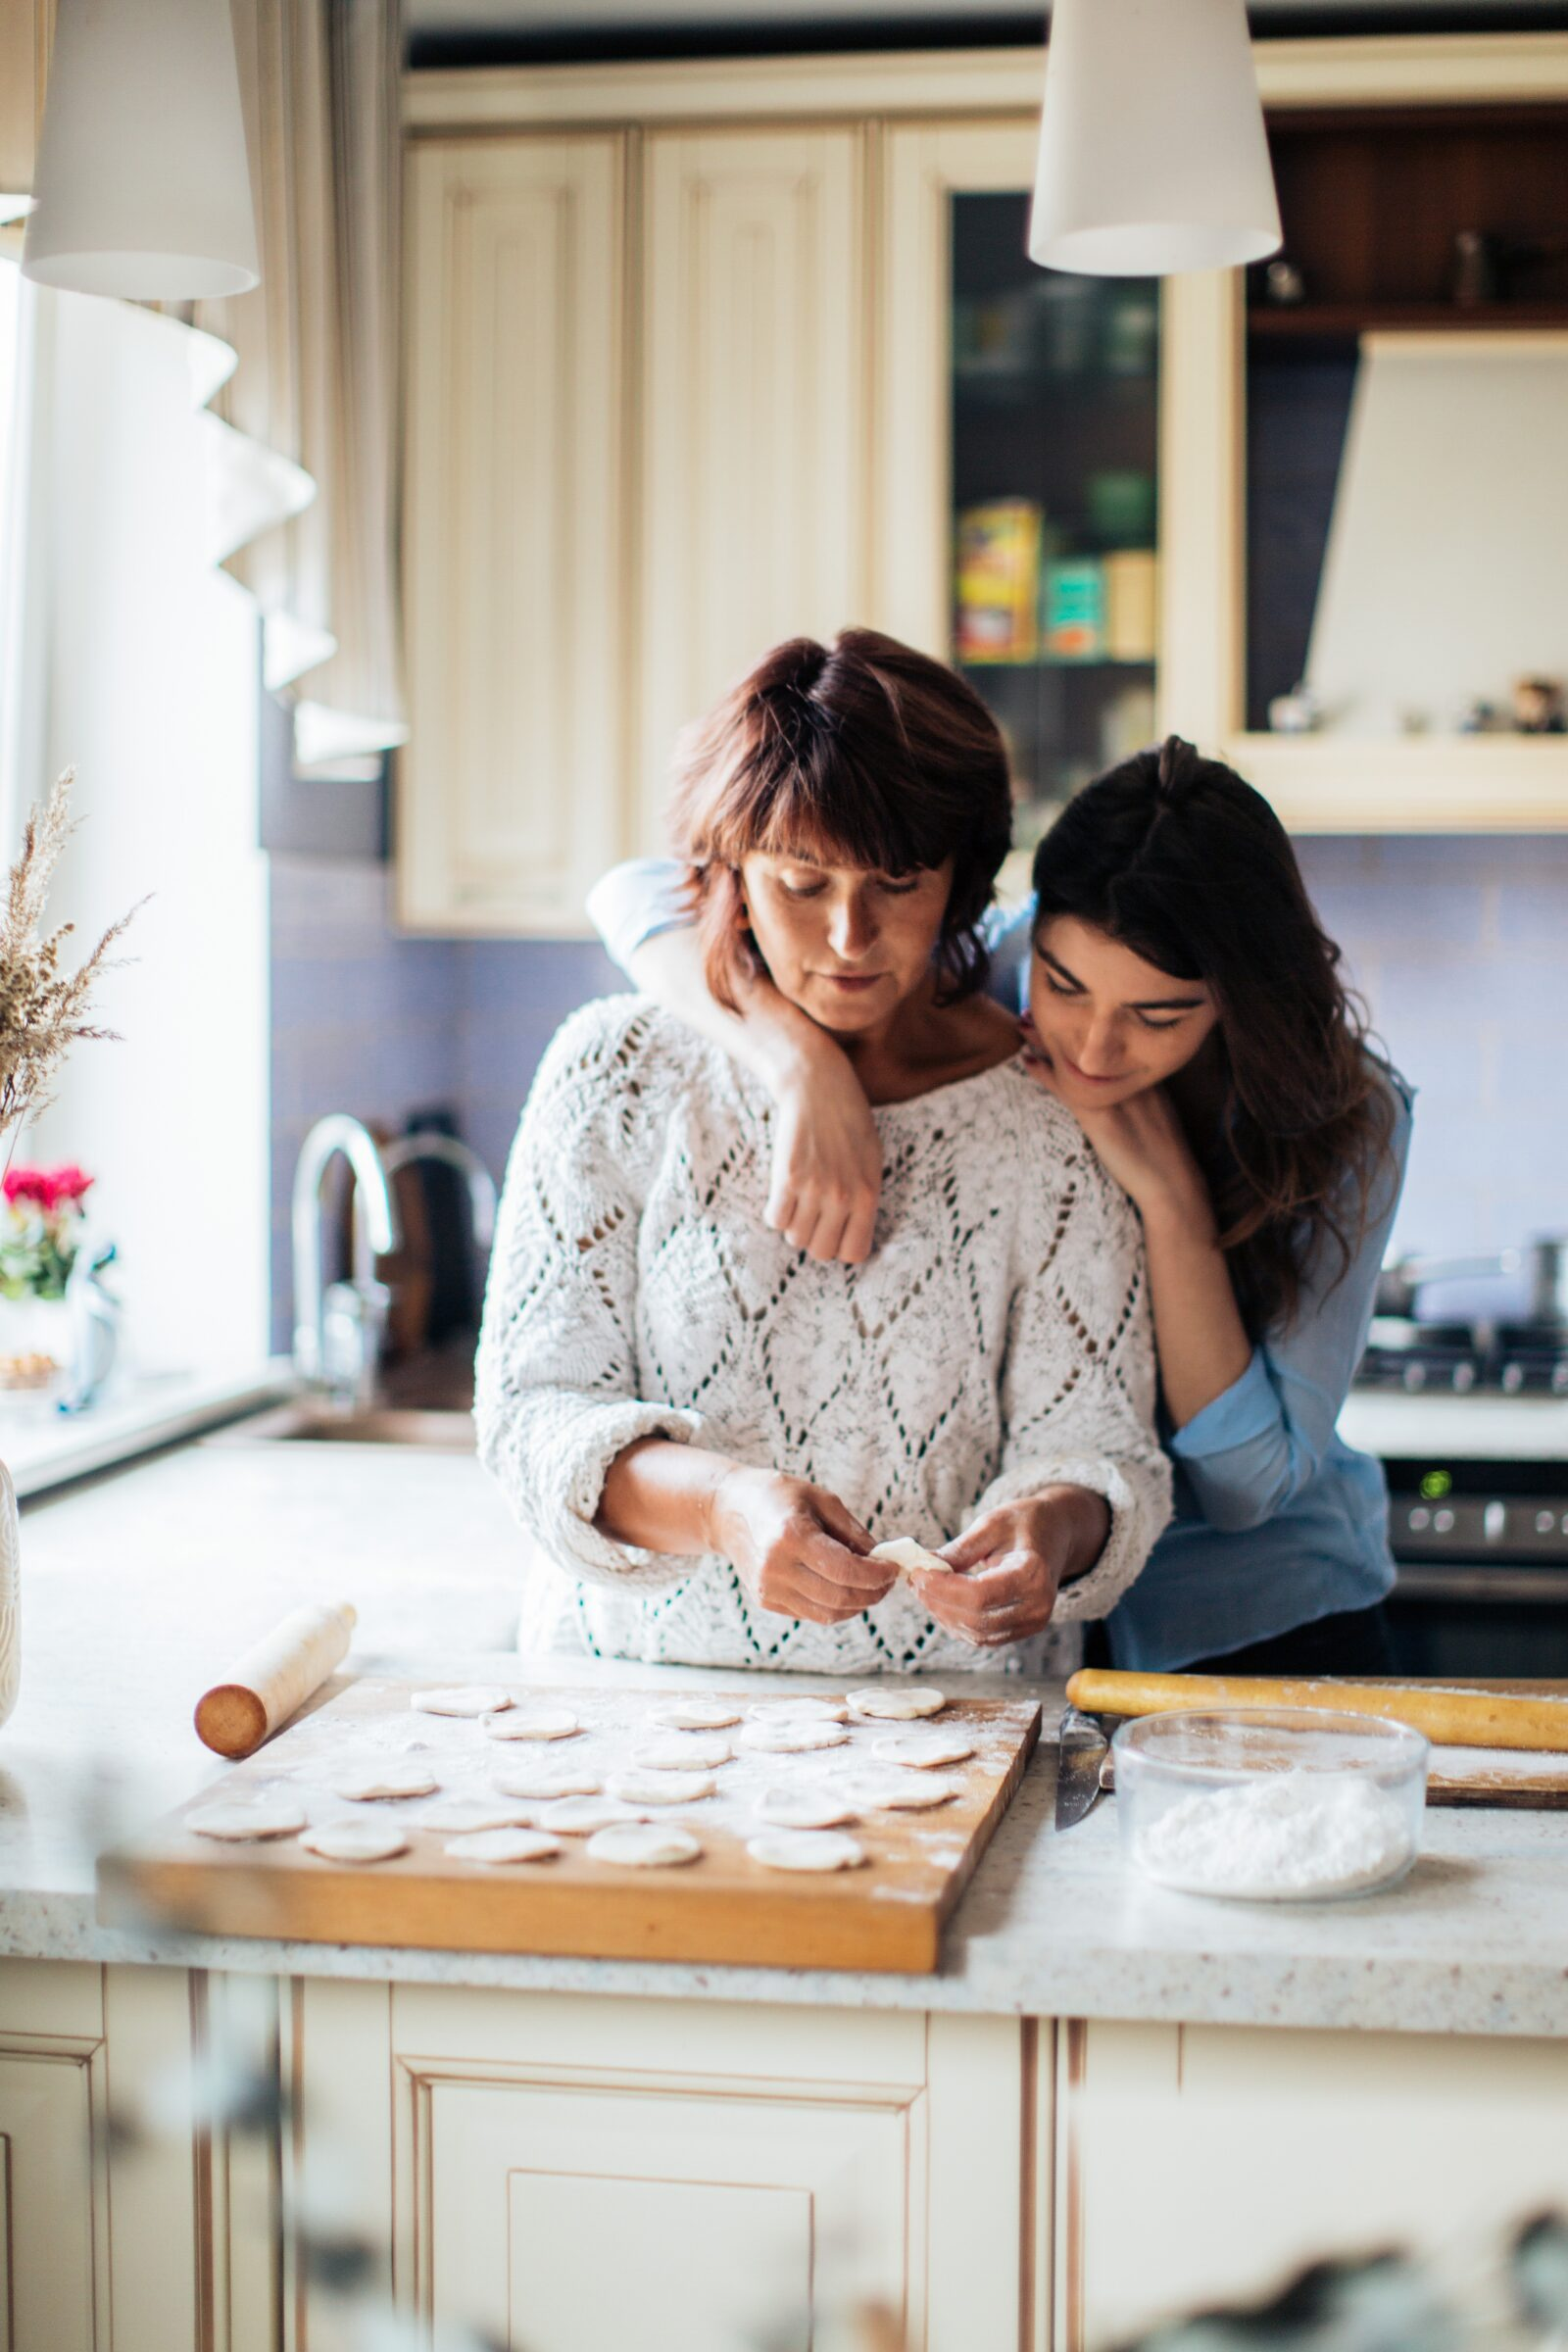 Women Making Pelmeni 3893532